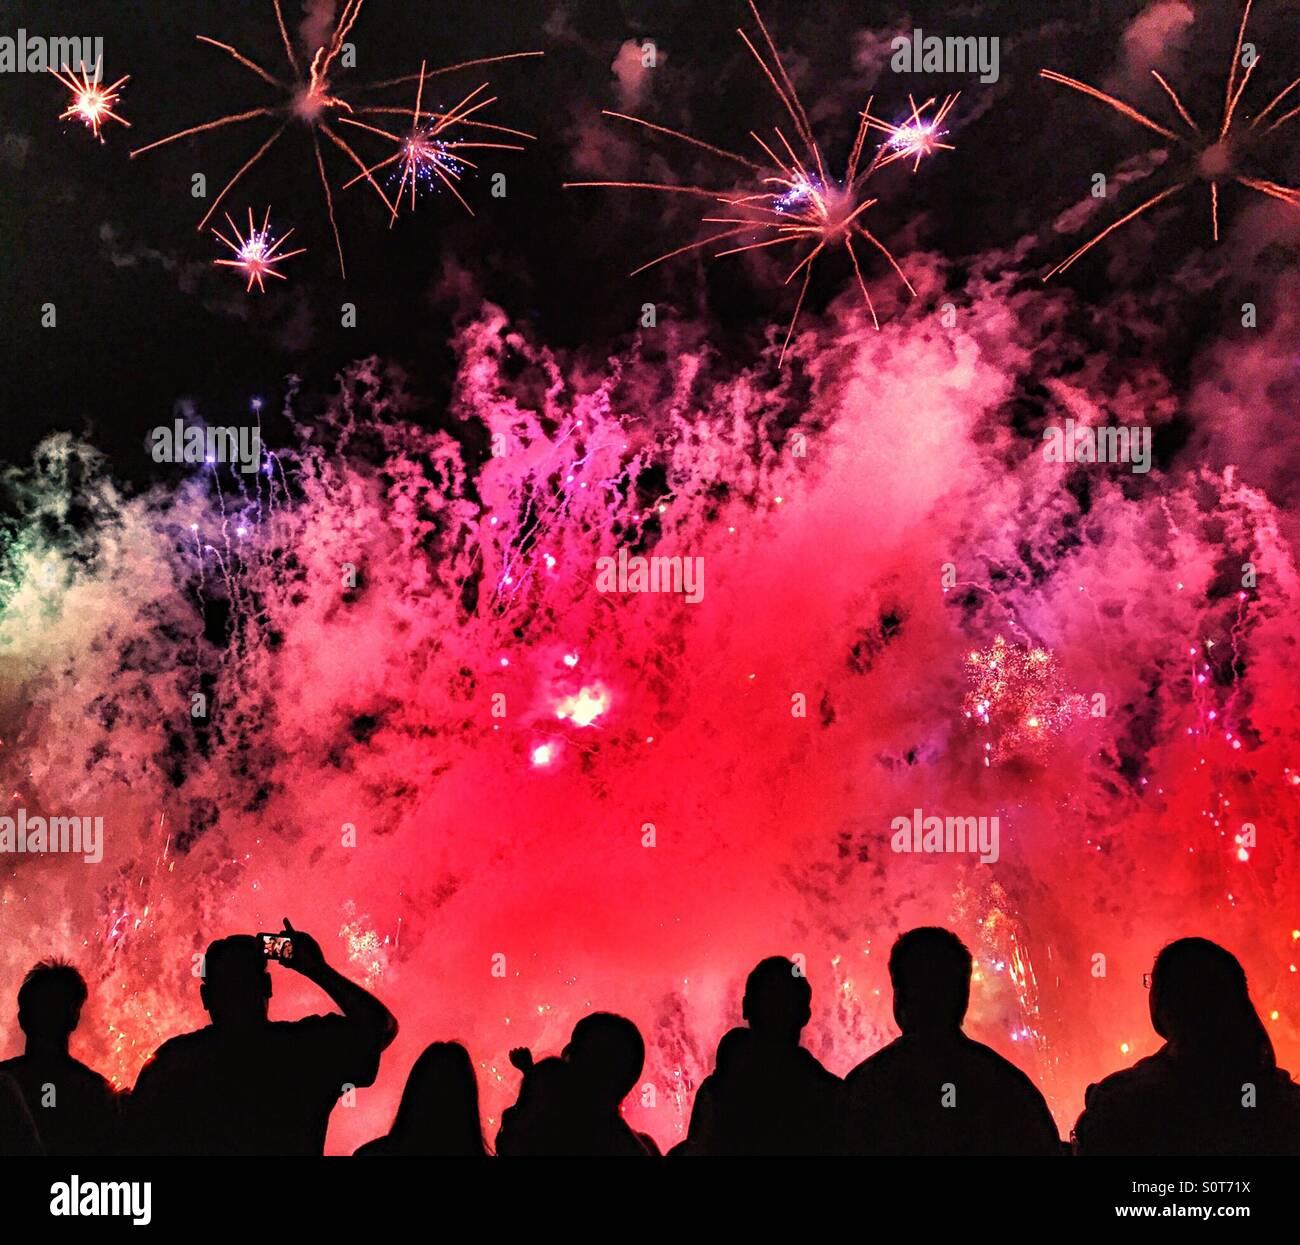 crowd watching fireworks - Stock Image